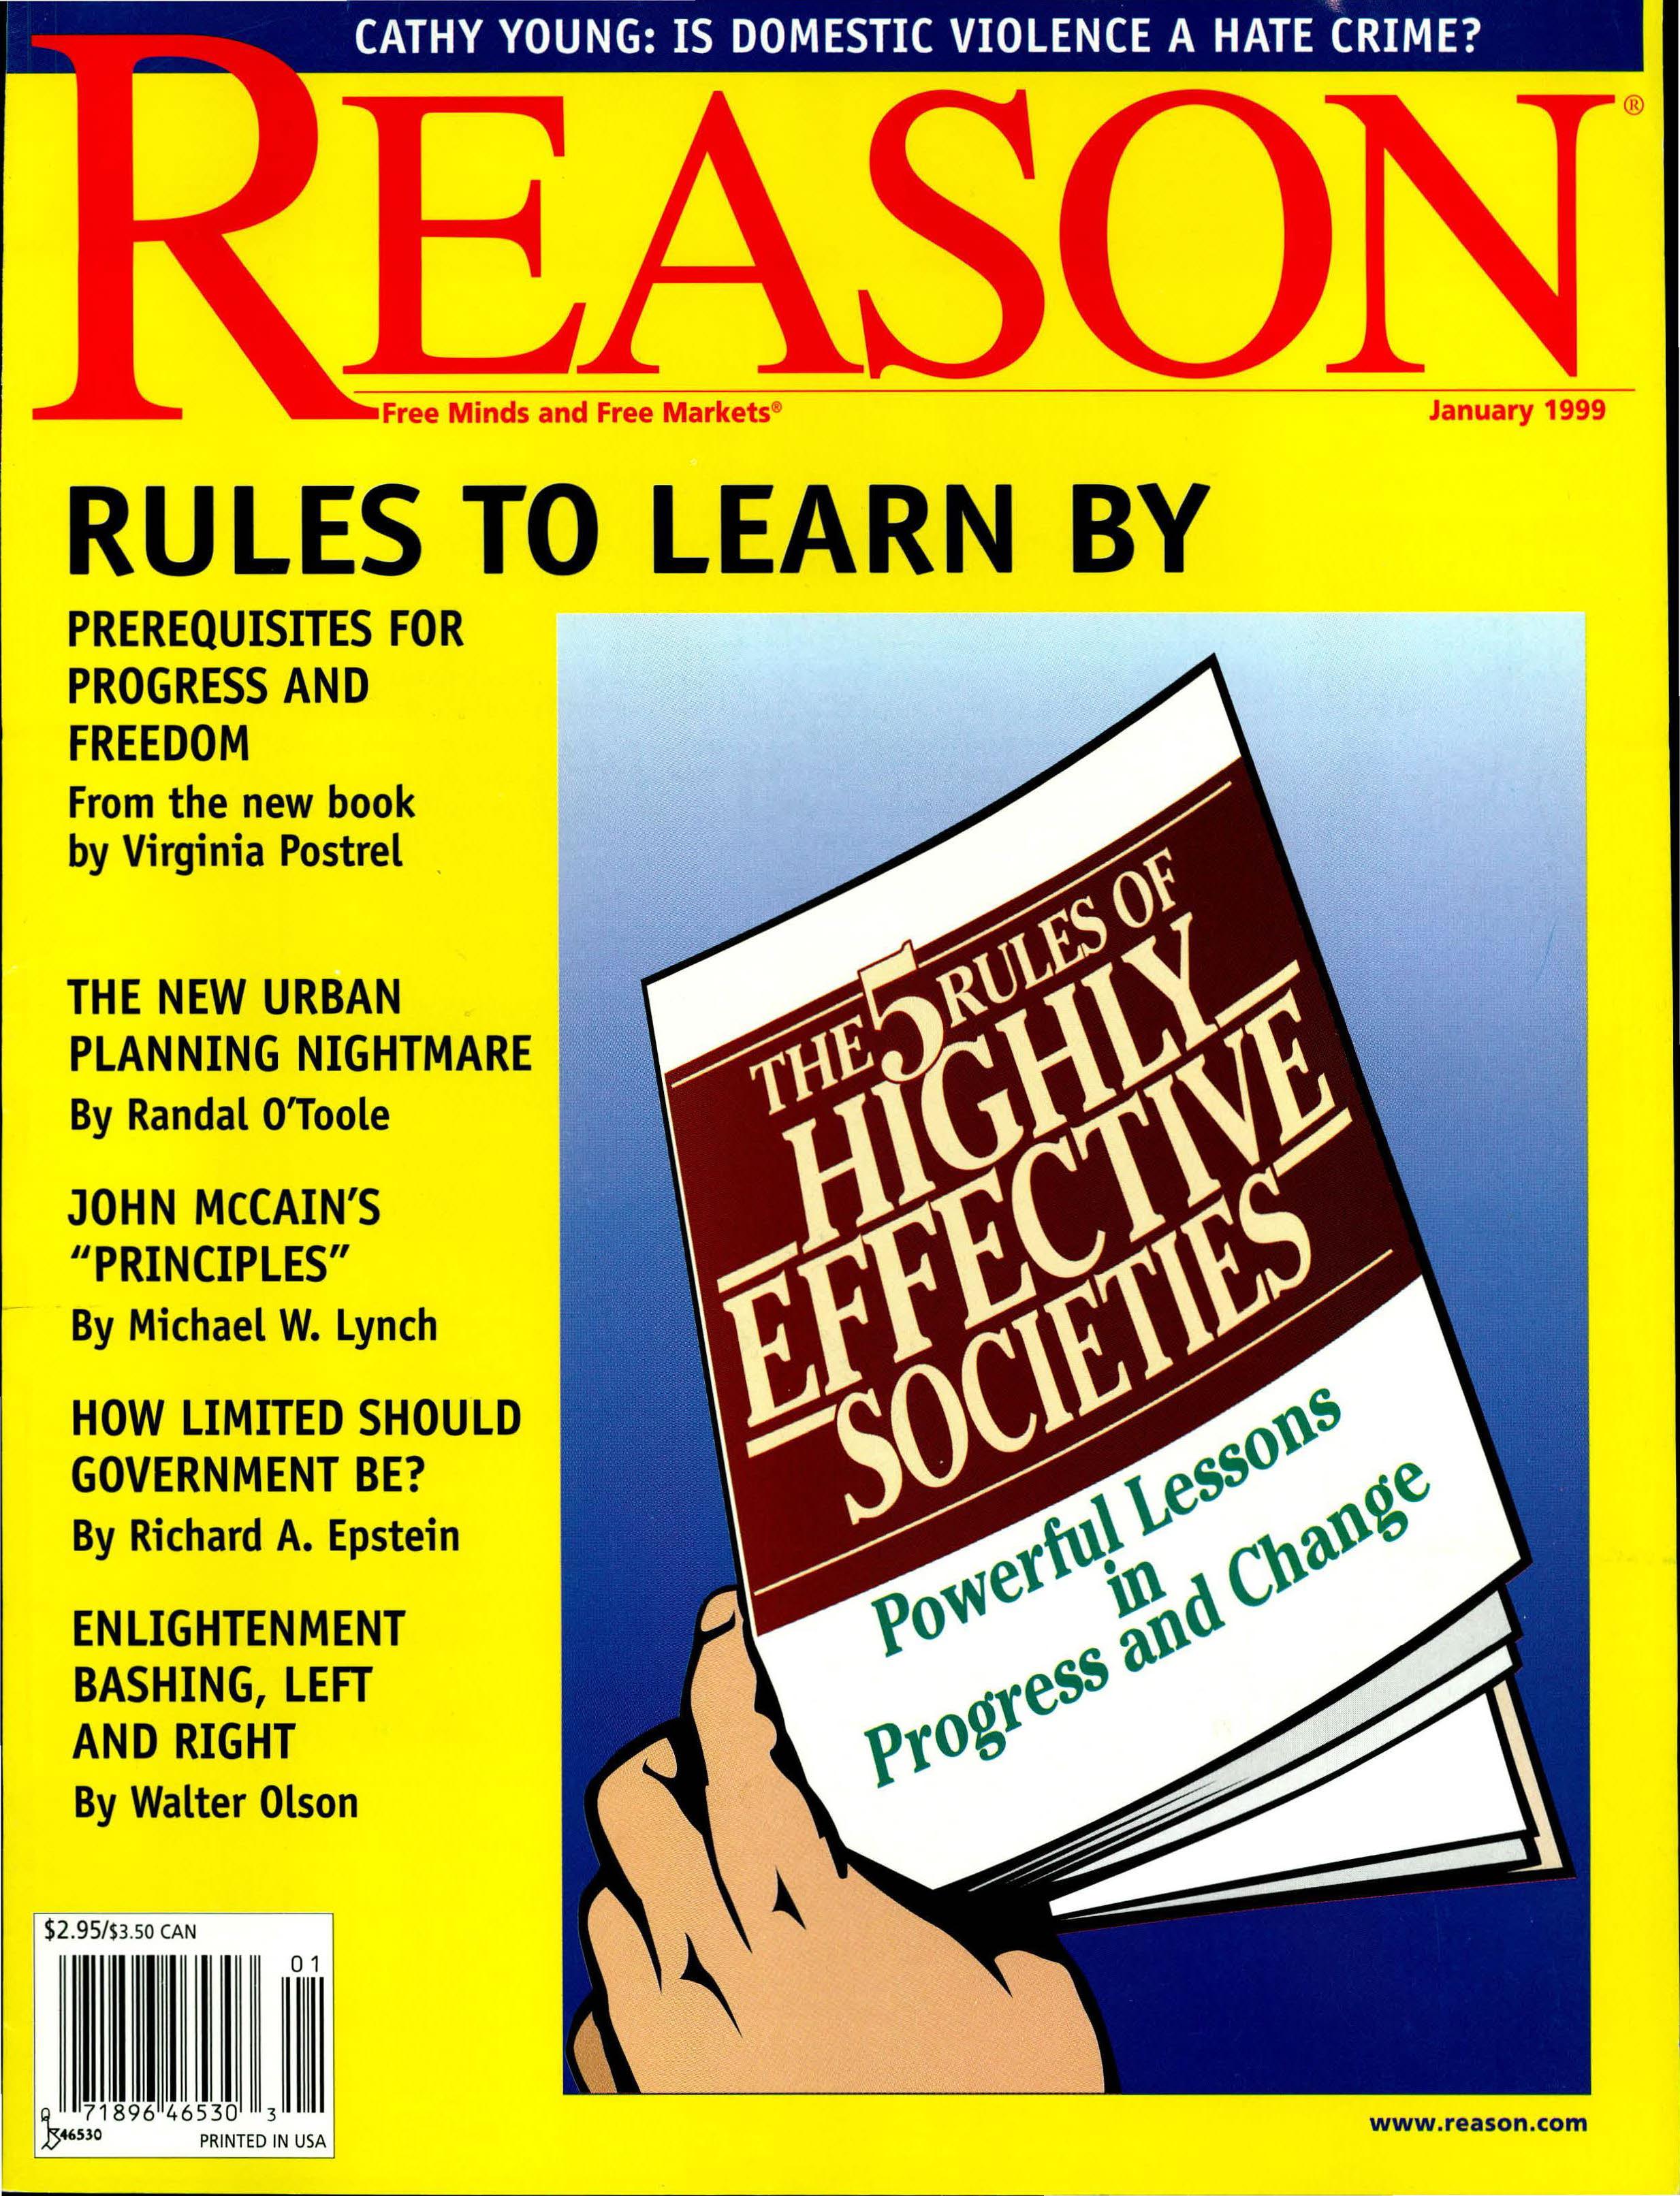 Reason Magazine, January 1999 cover image